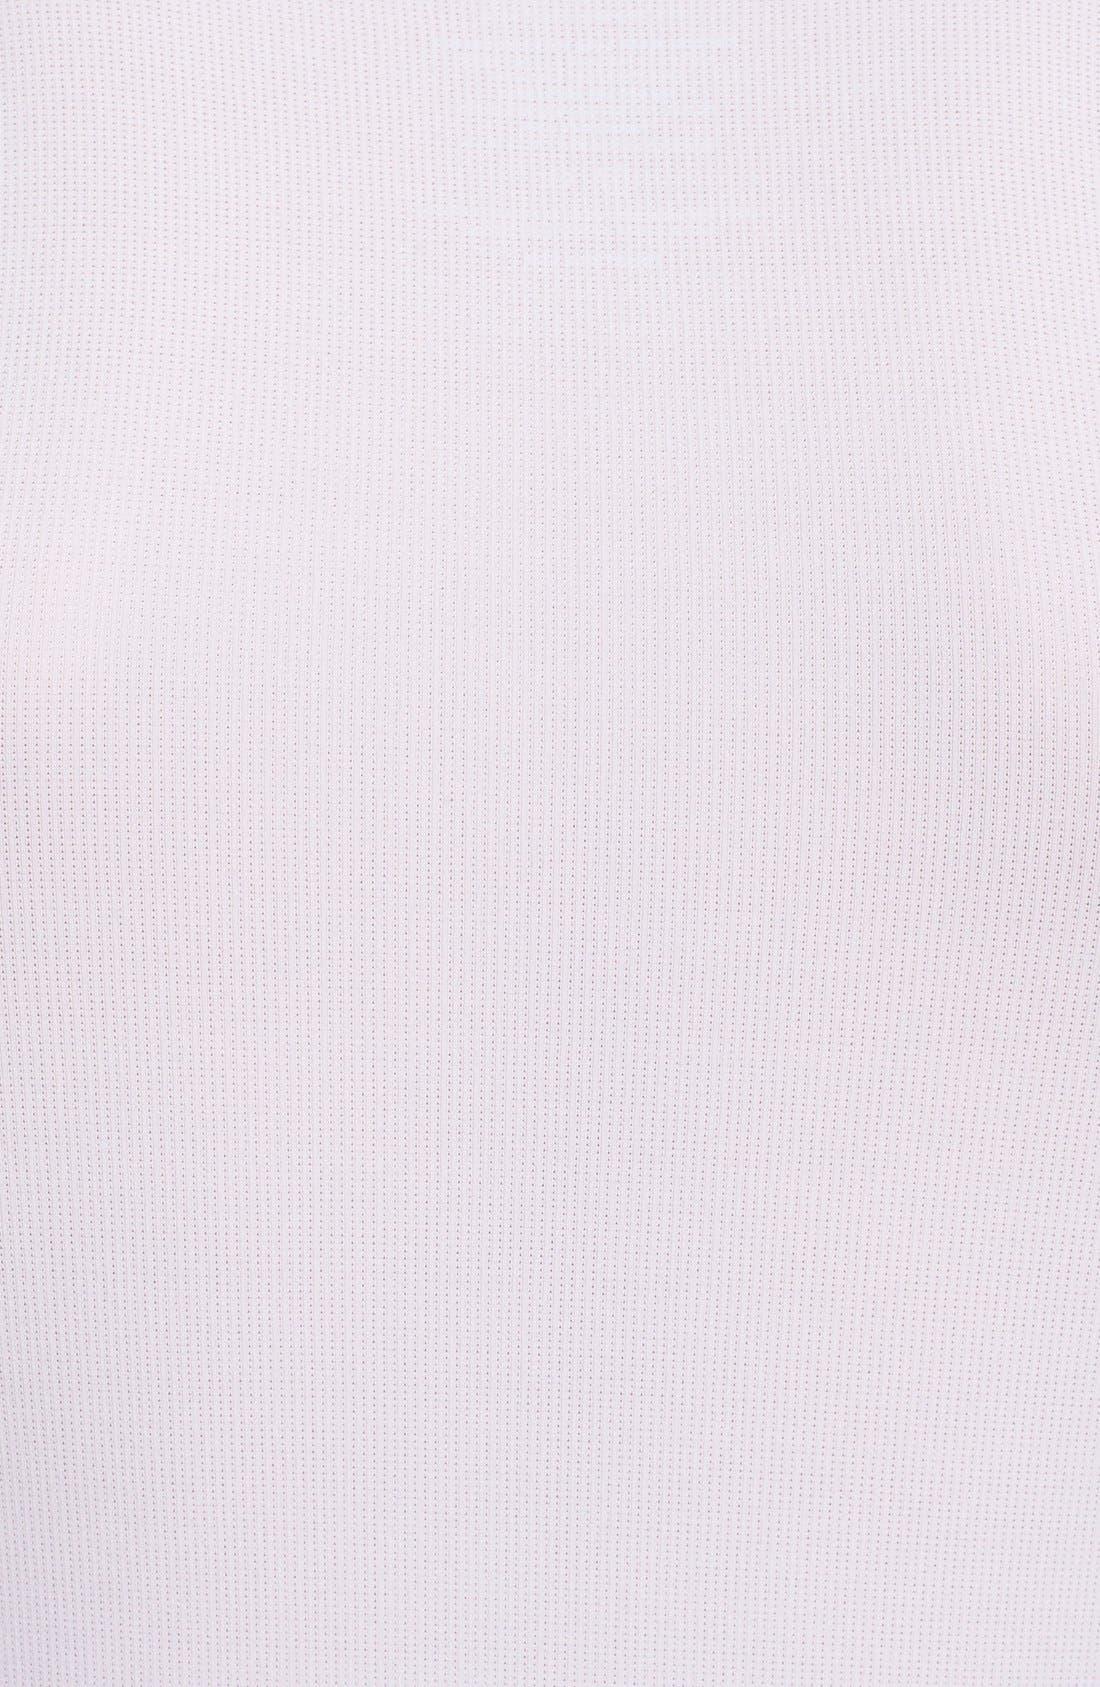 'Air' Tank Undershirt,                             Alternate thumbnail 3, color,                             White